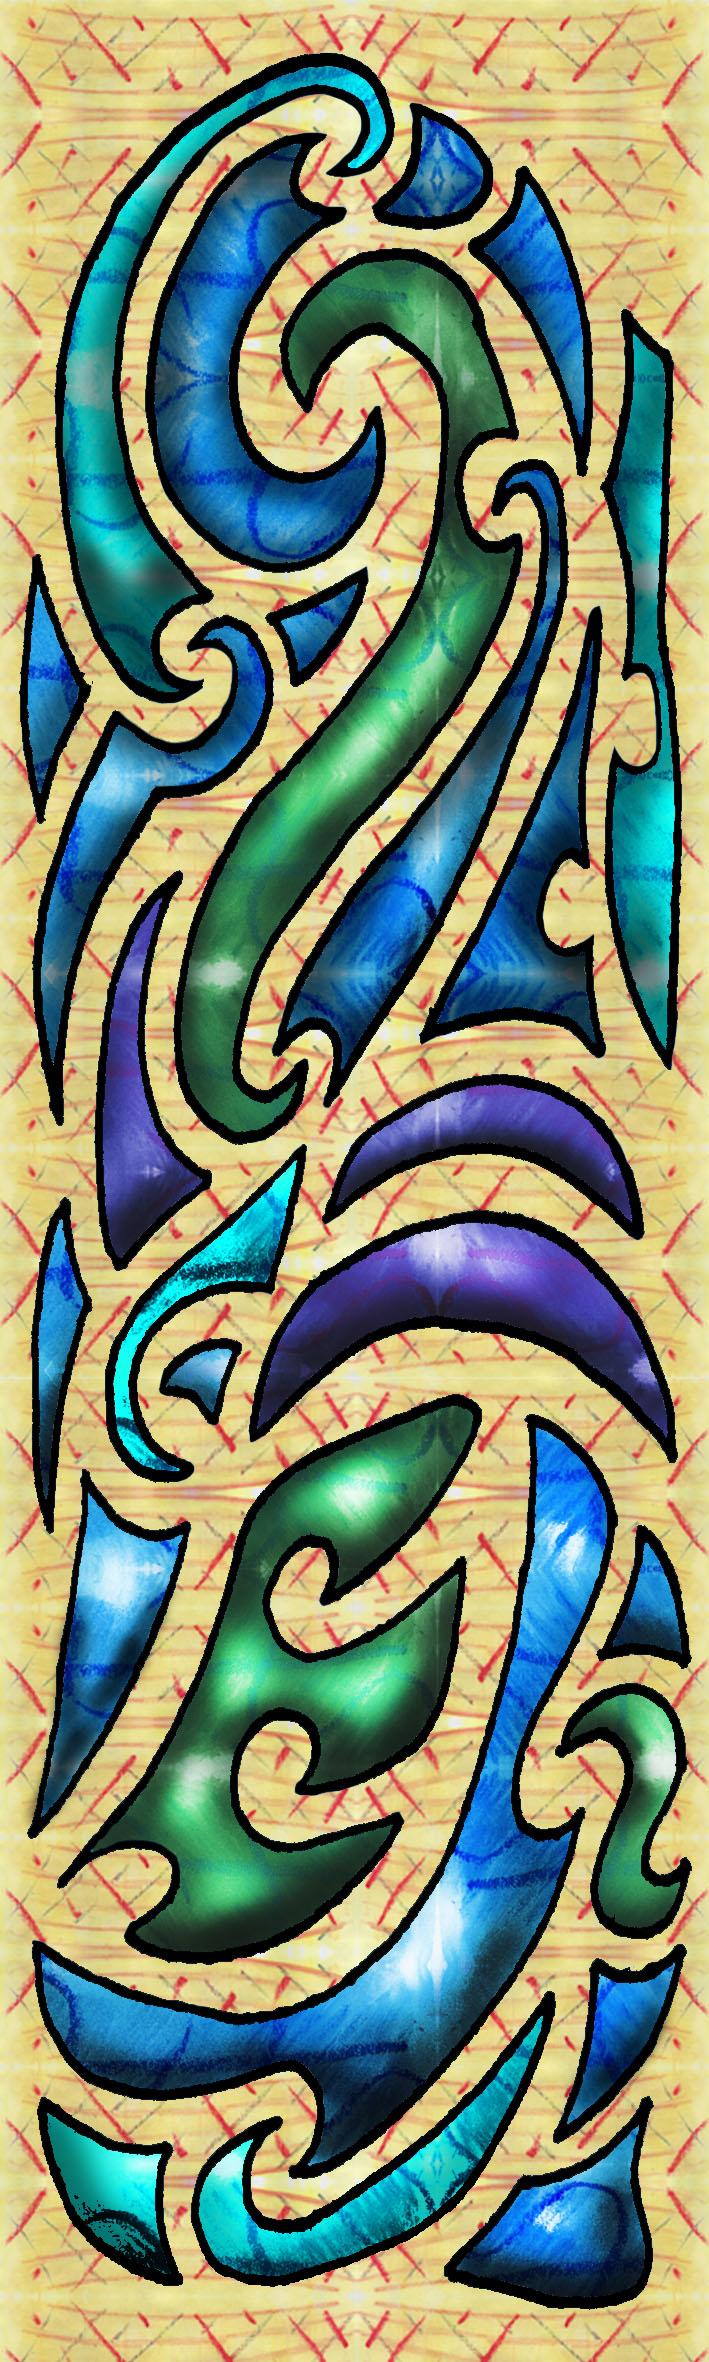 maori pattern deviantart cultural